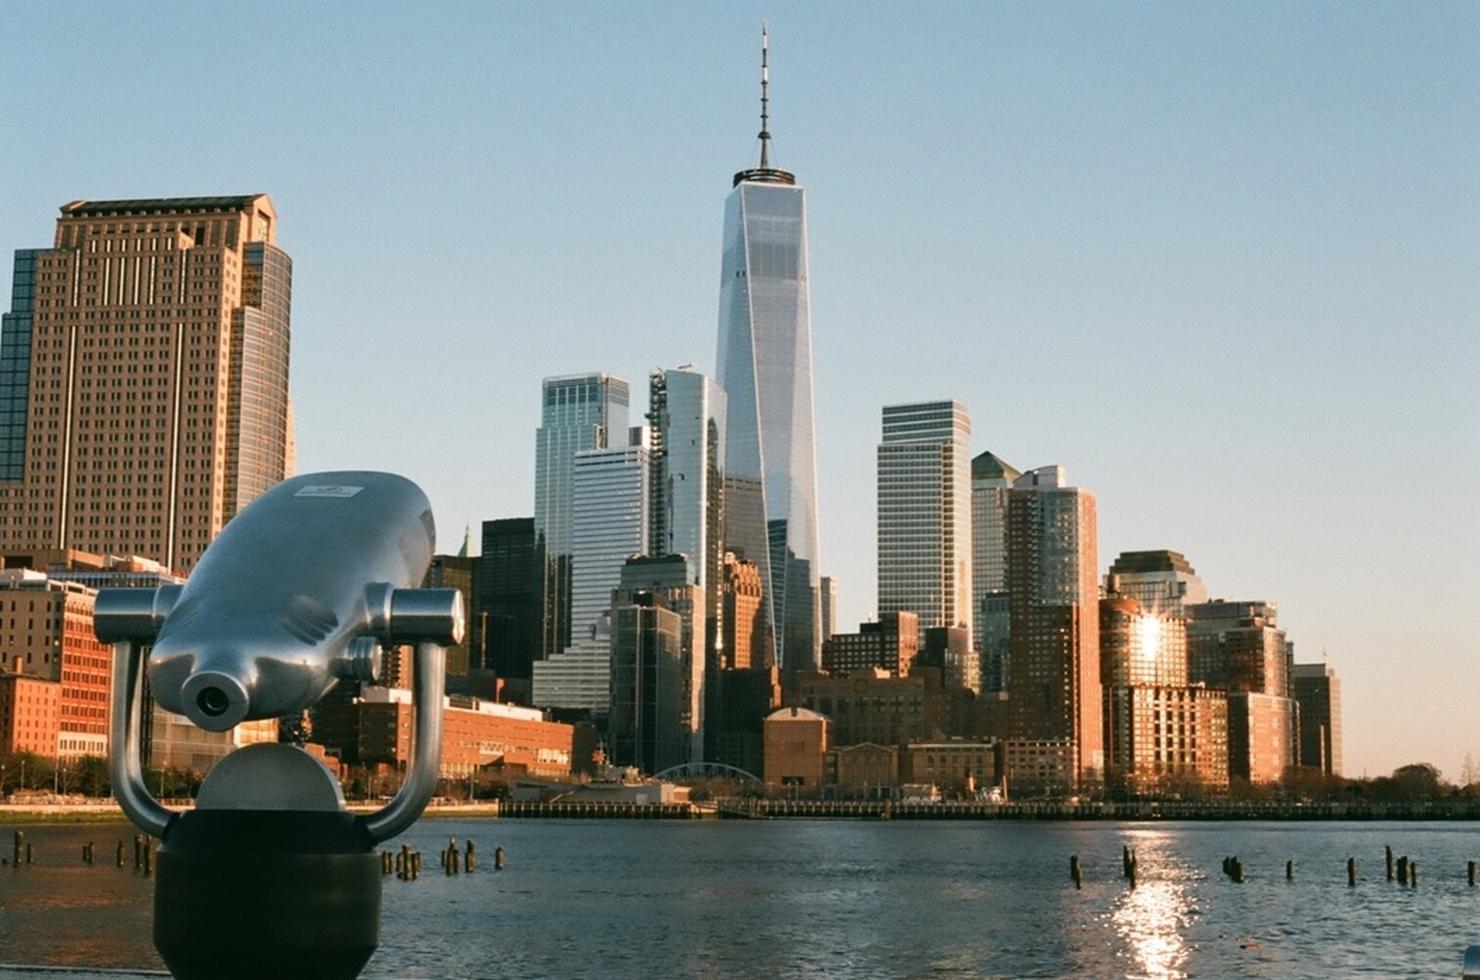 Telescope looking towards the One World Trade Center photo